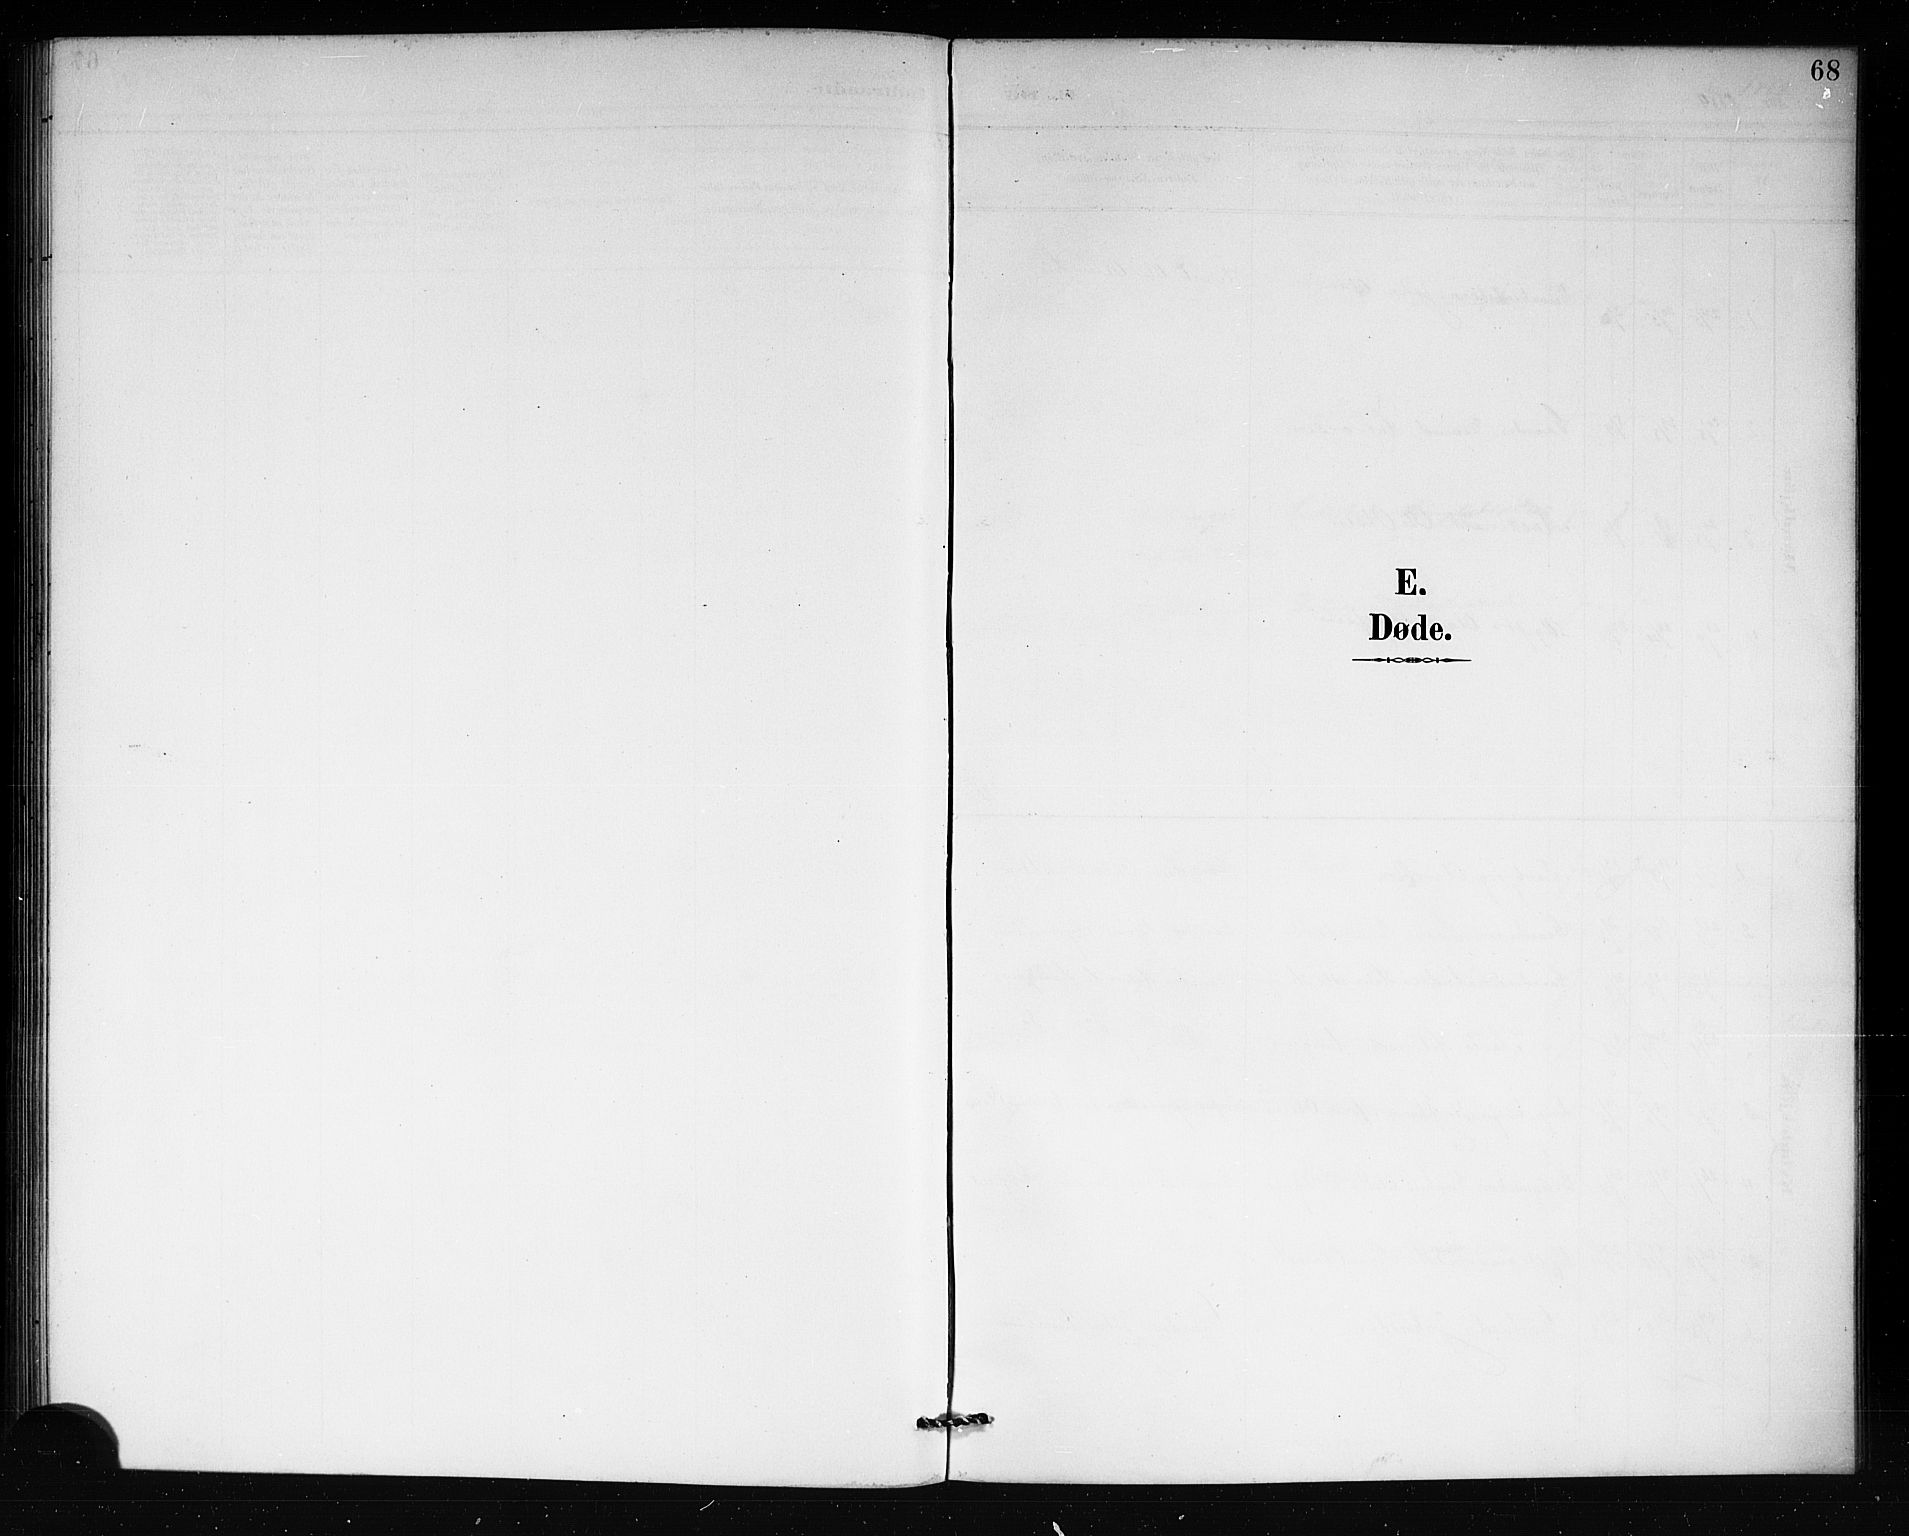 SAKO, Lårdal kirkebøker, G/Gb/L0003: Klokkerbok nr. II 3, 1889-1920, s. 68